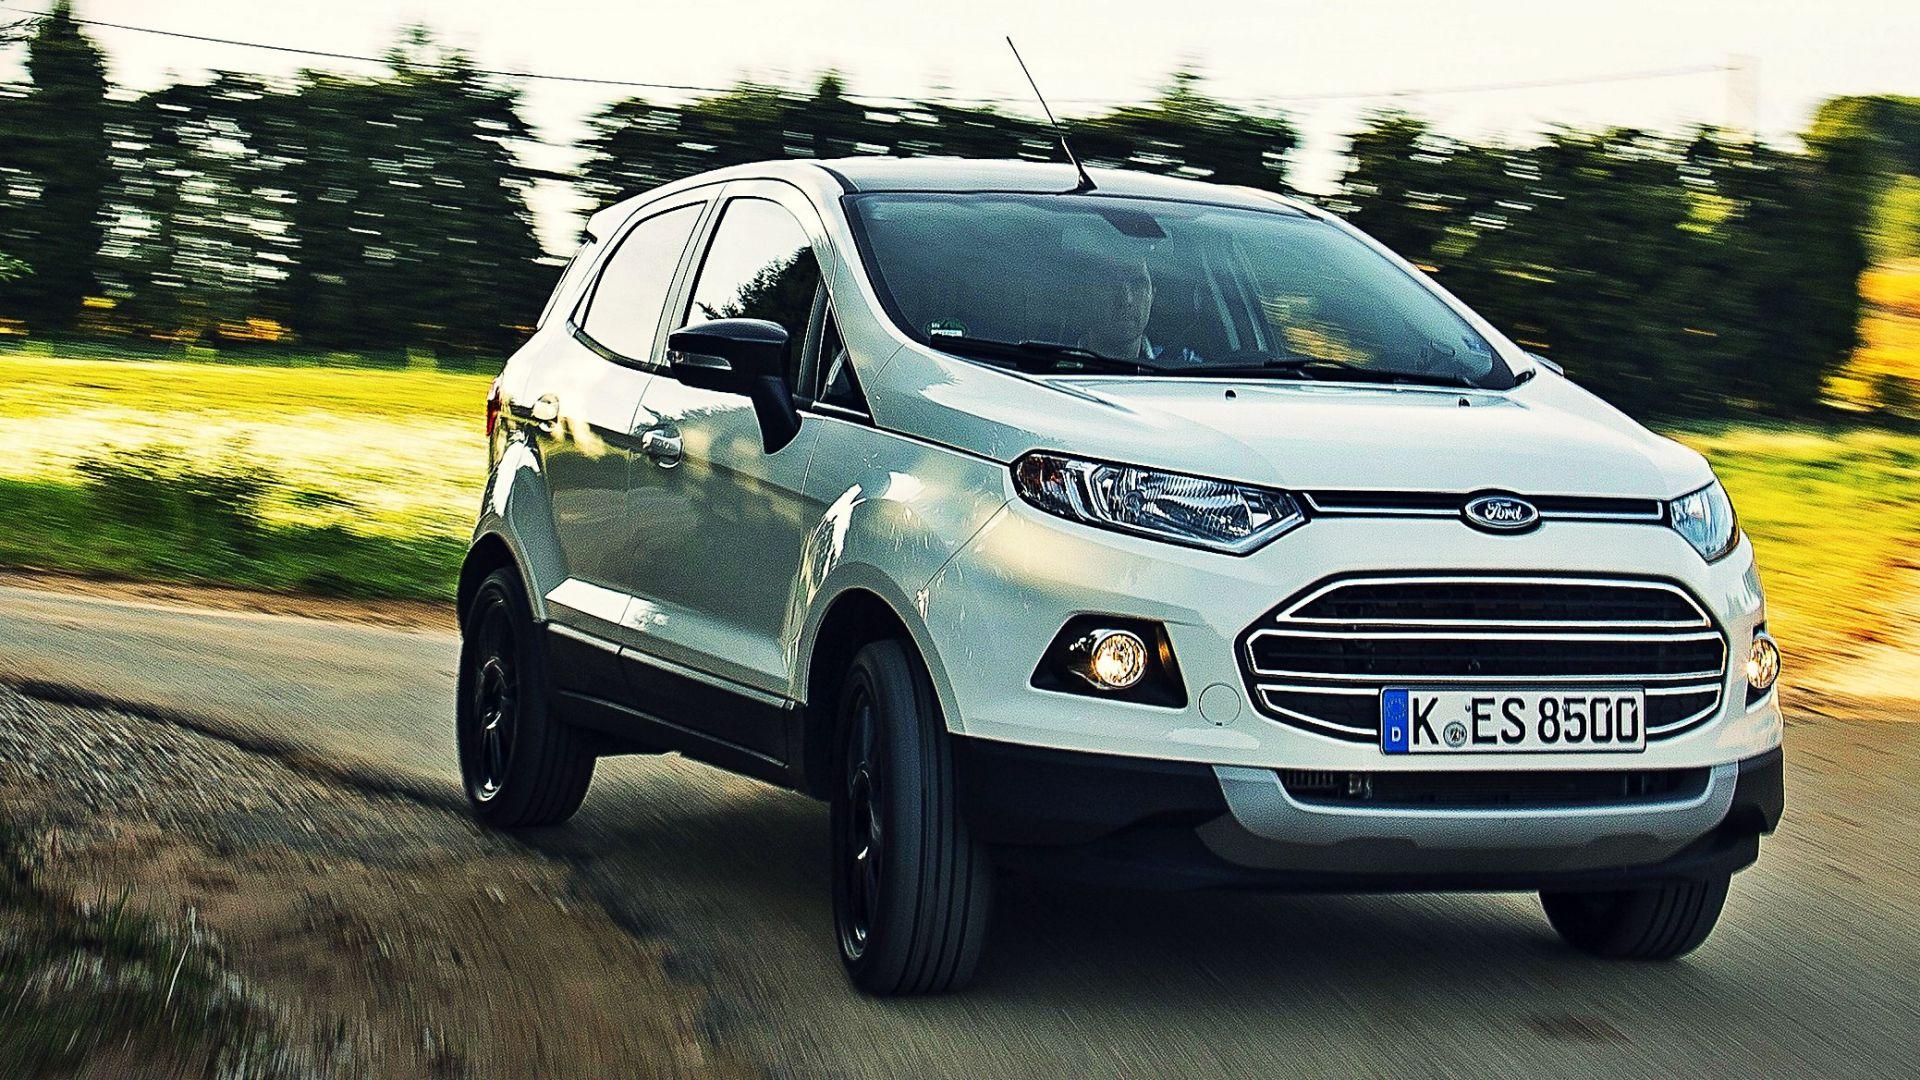 Image Result For Ford Ecosport Quanto Costa